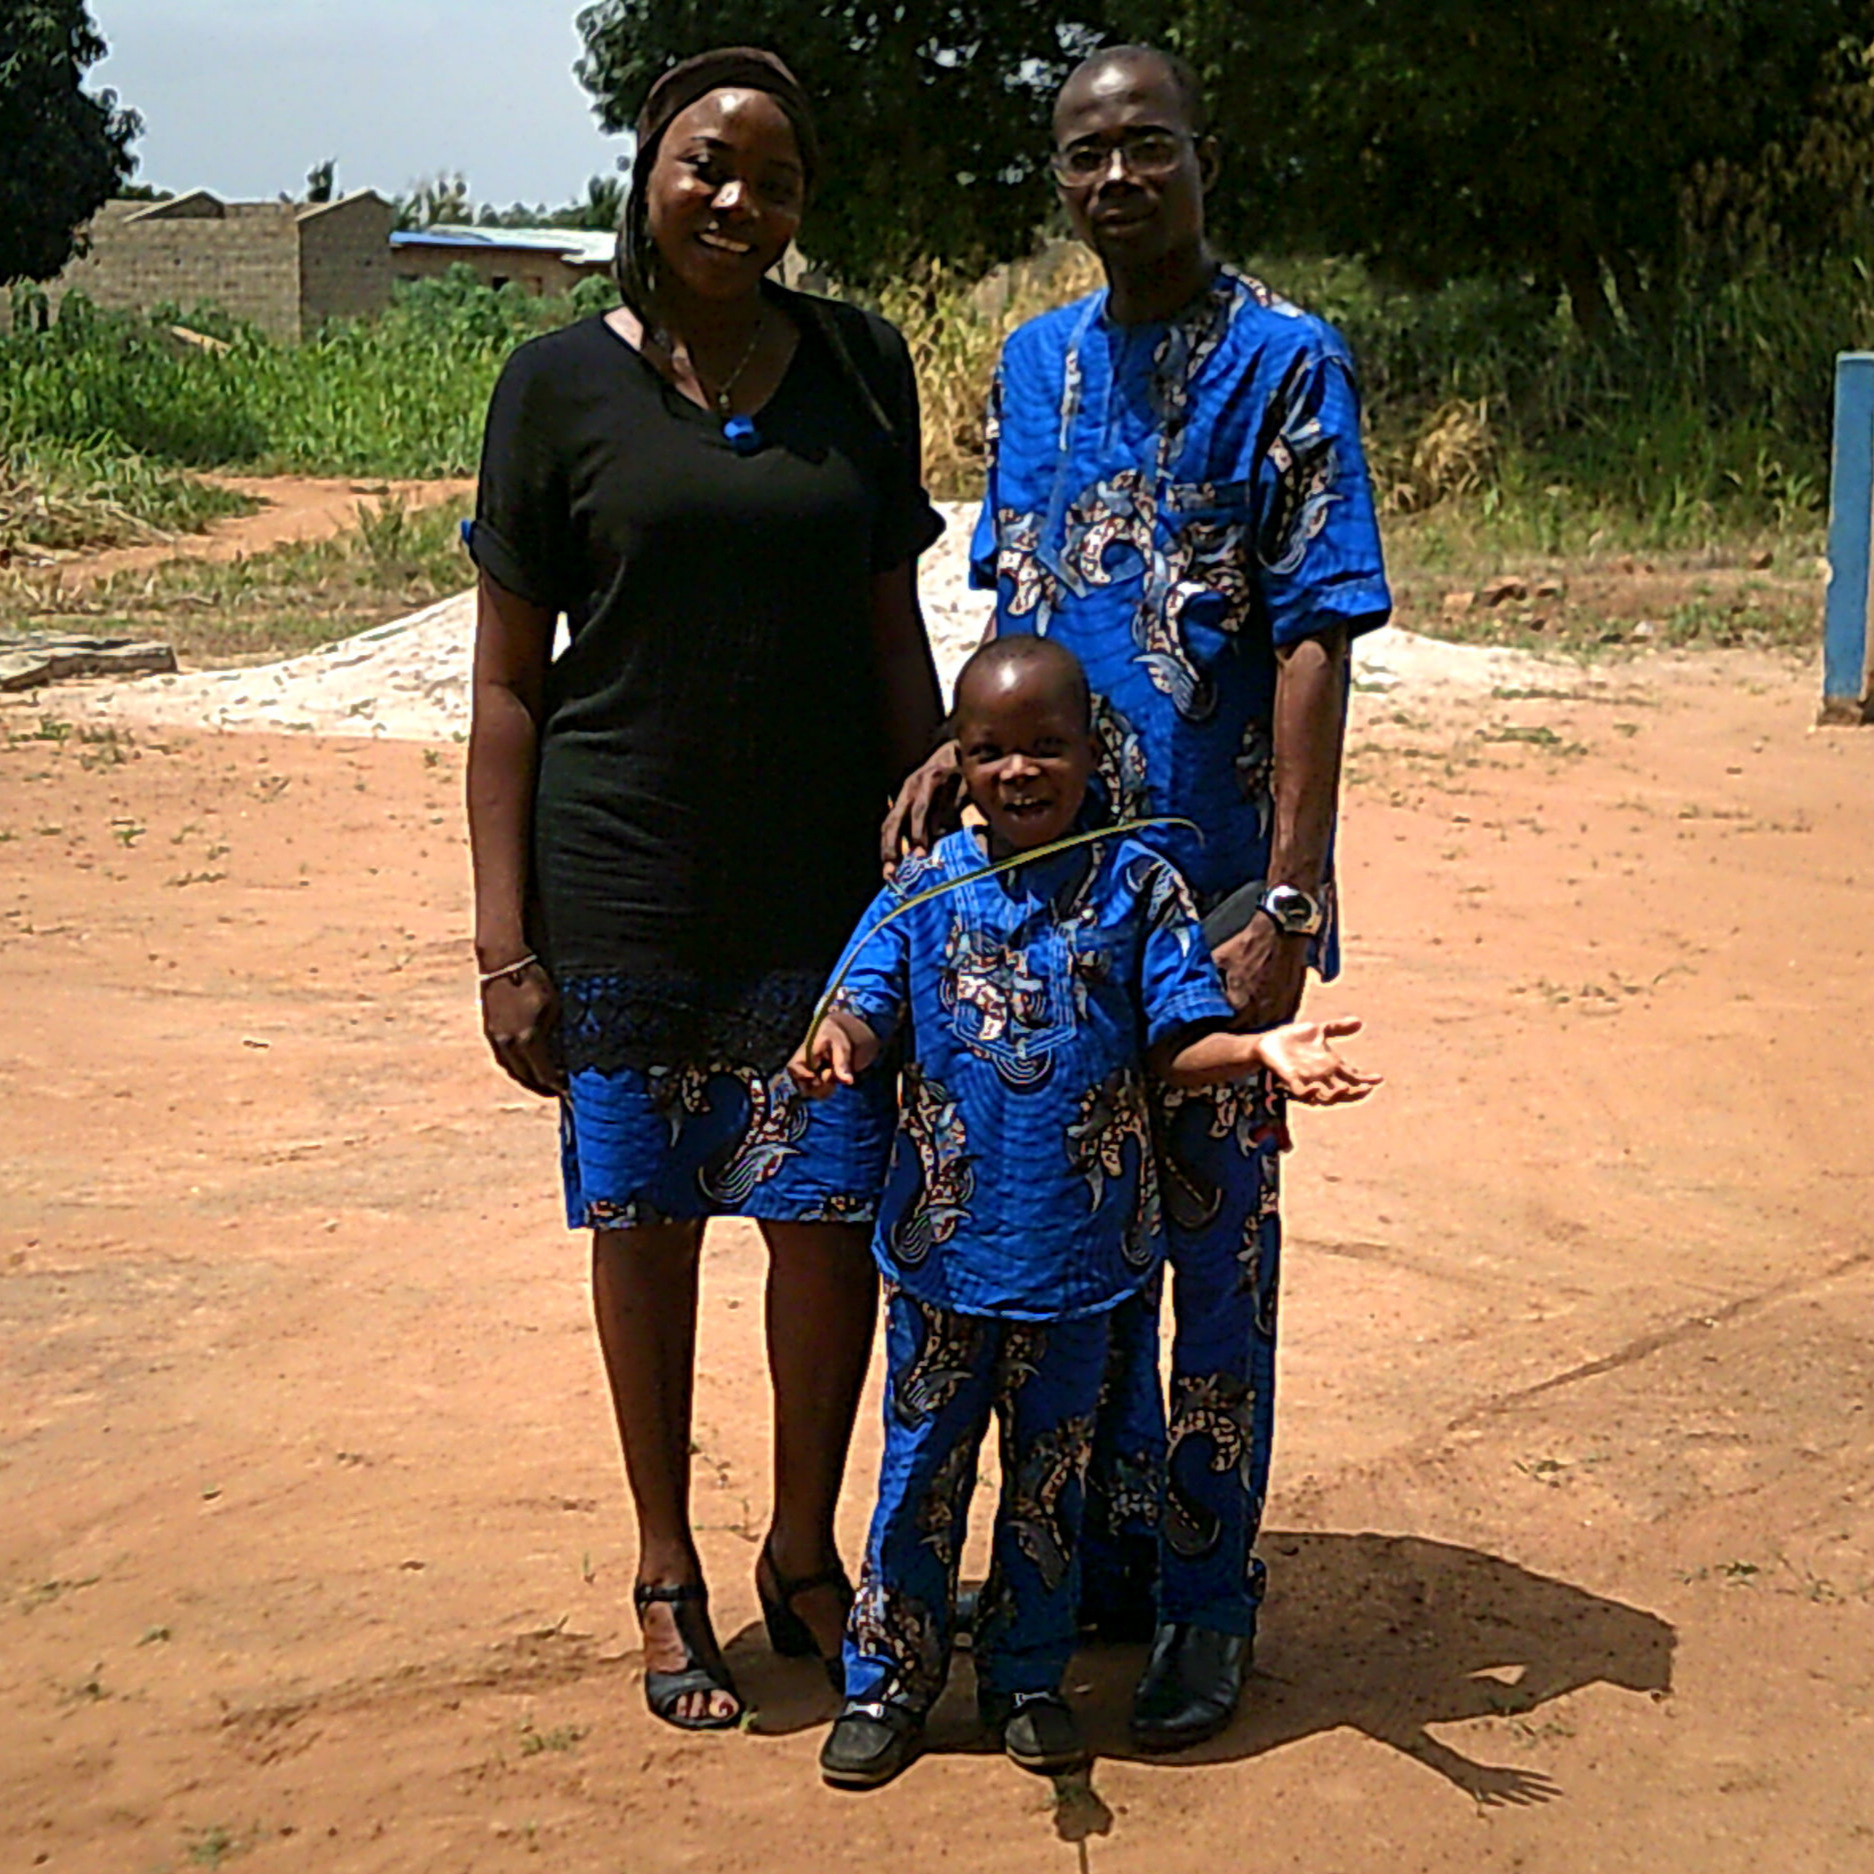 Mawuli and Stella TogbiWOnyo in Togo